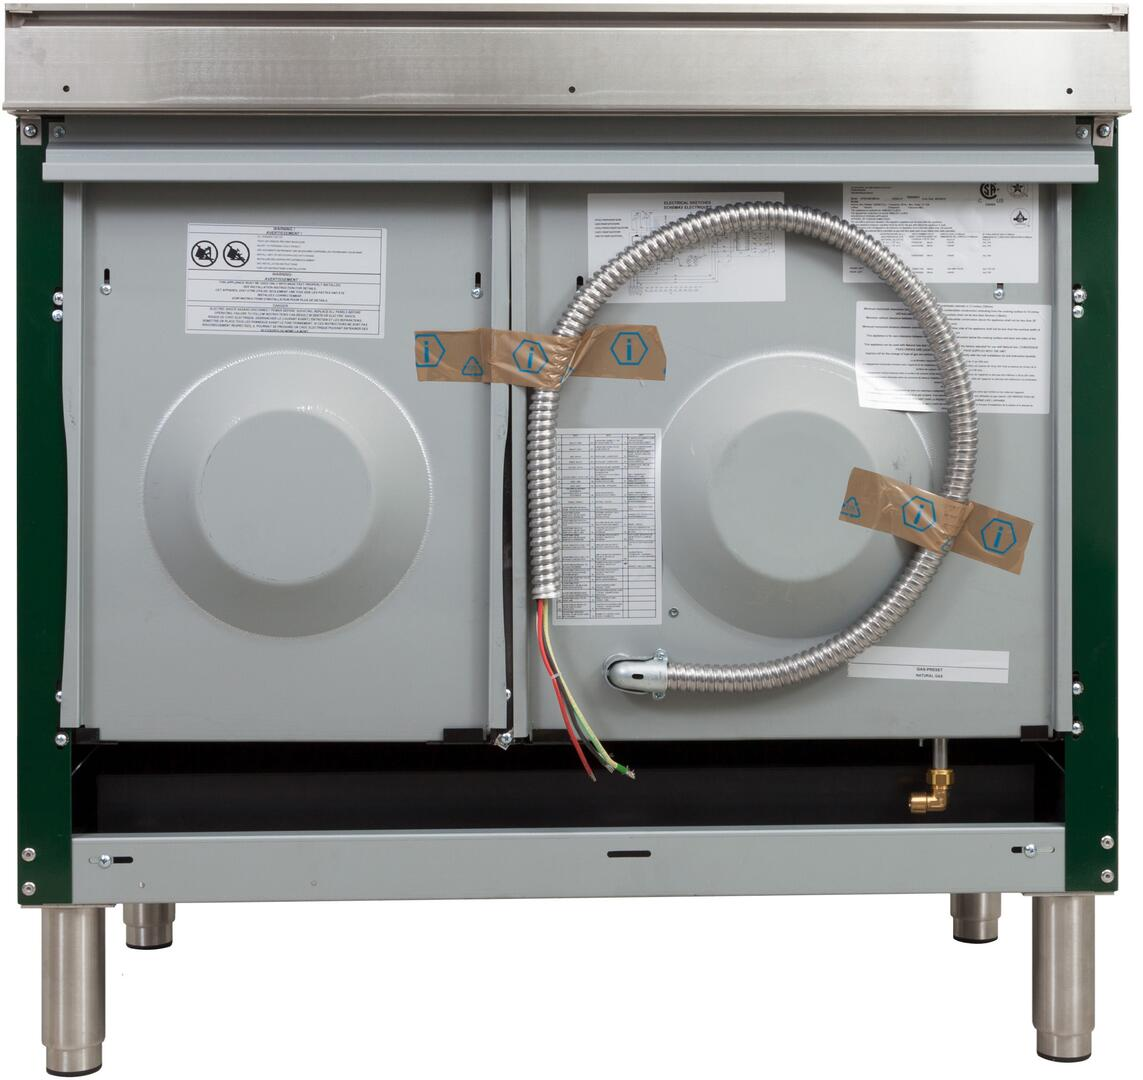 Ilve Nostalgie UPDN100FDMPVSLP Freestanding Dual Fuel Range Green, UPDN100FDMPVSLP Back View